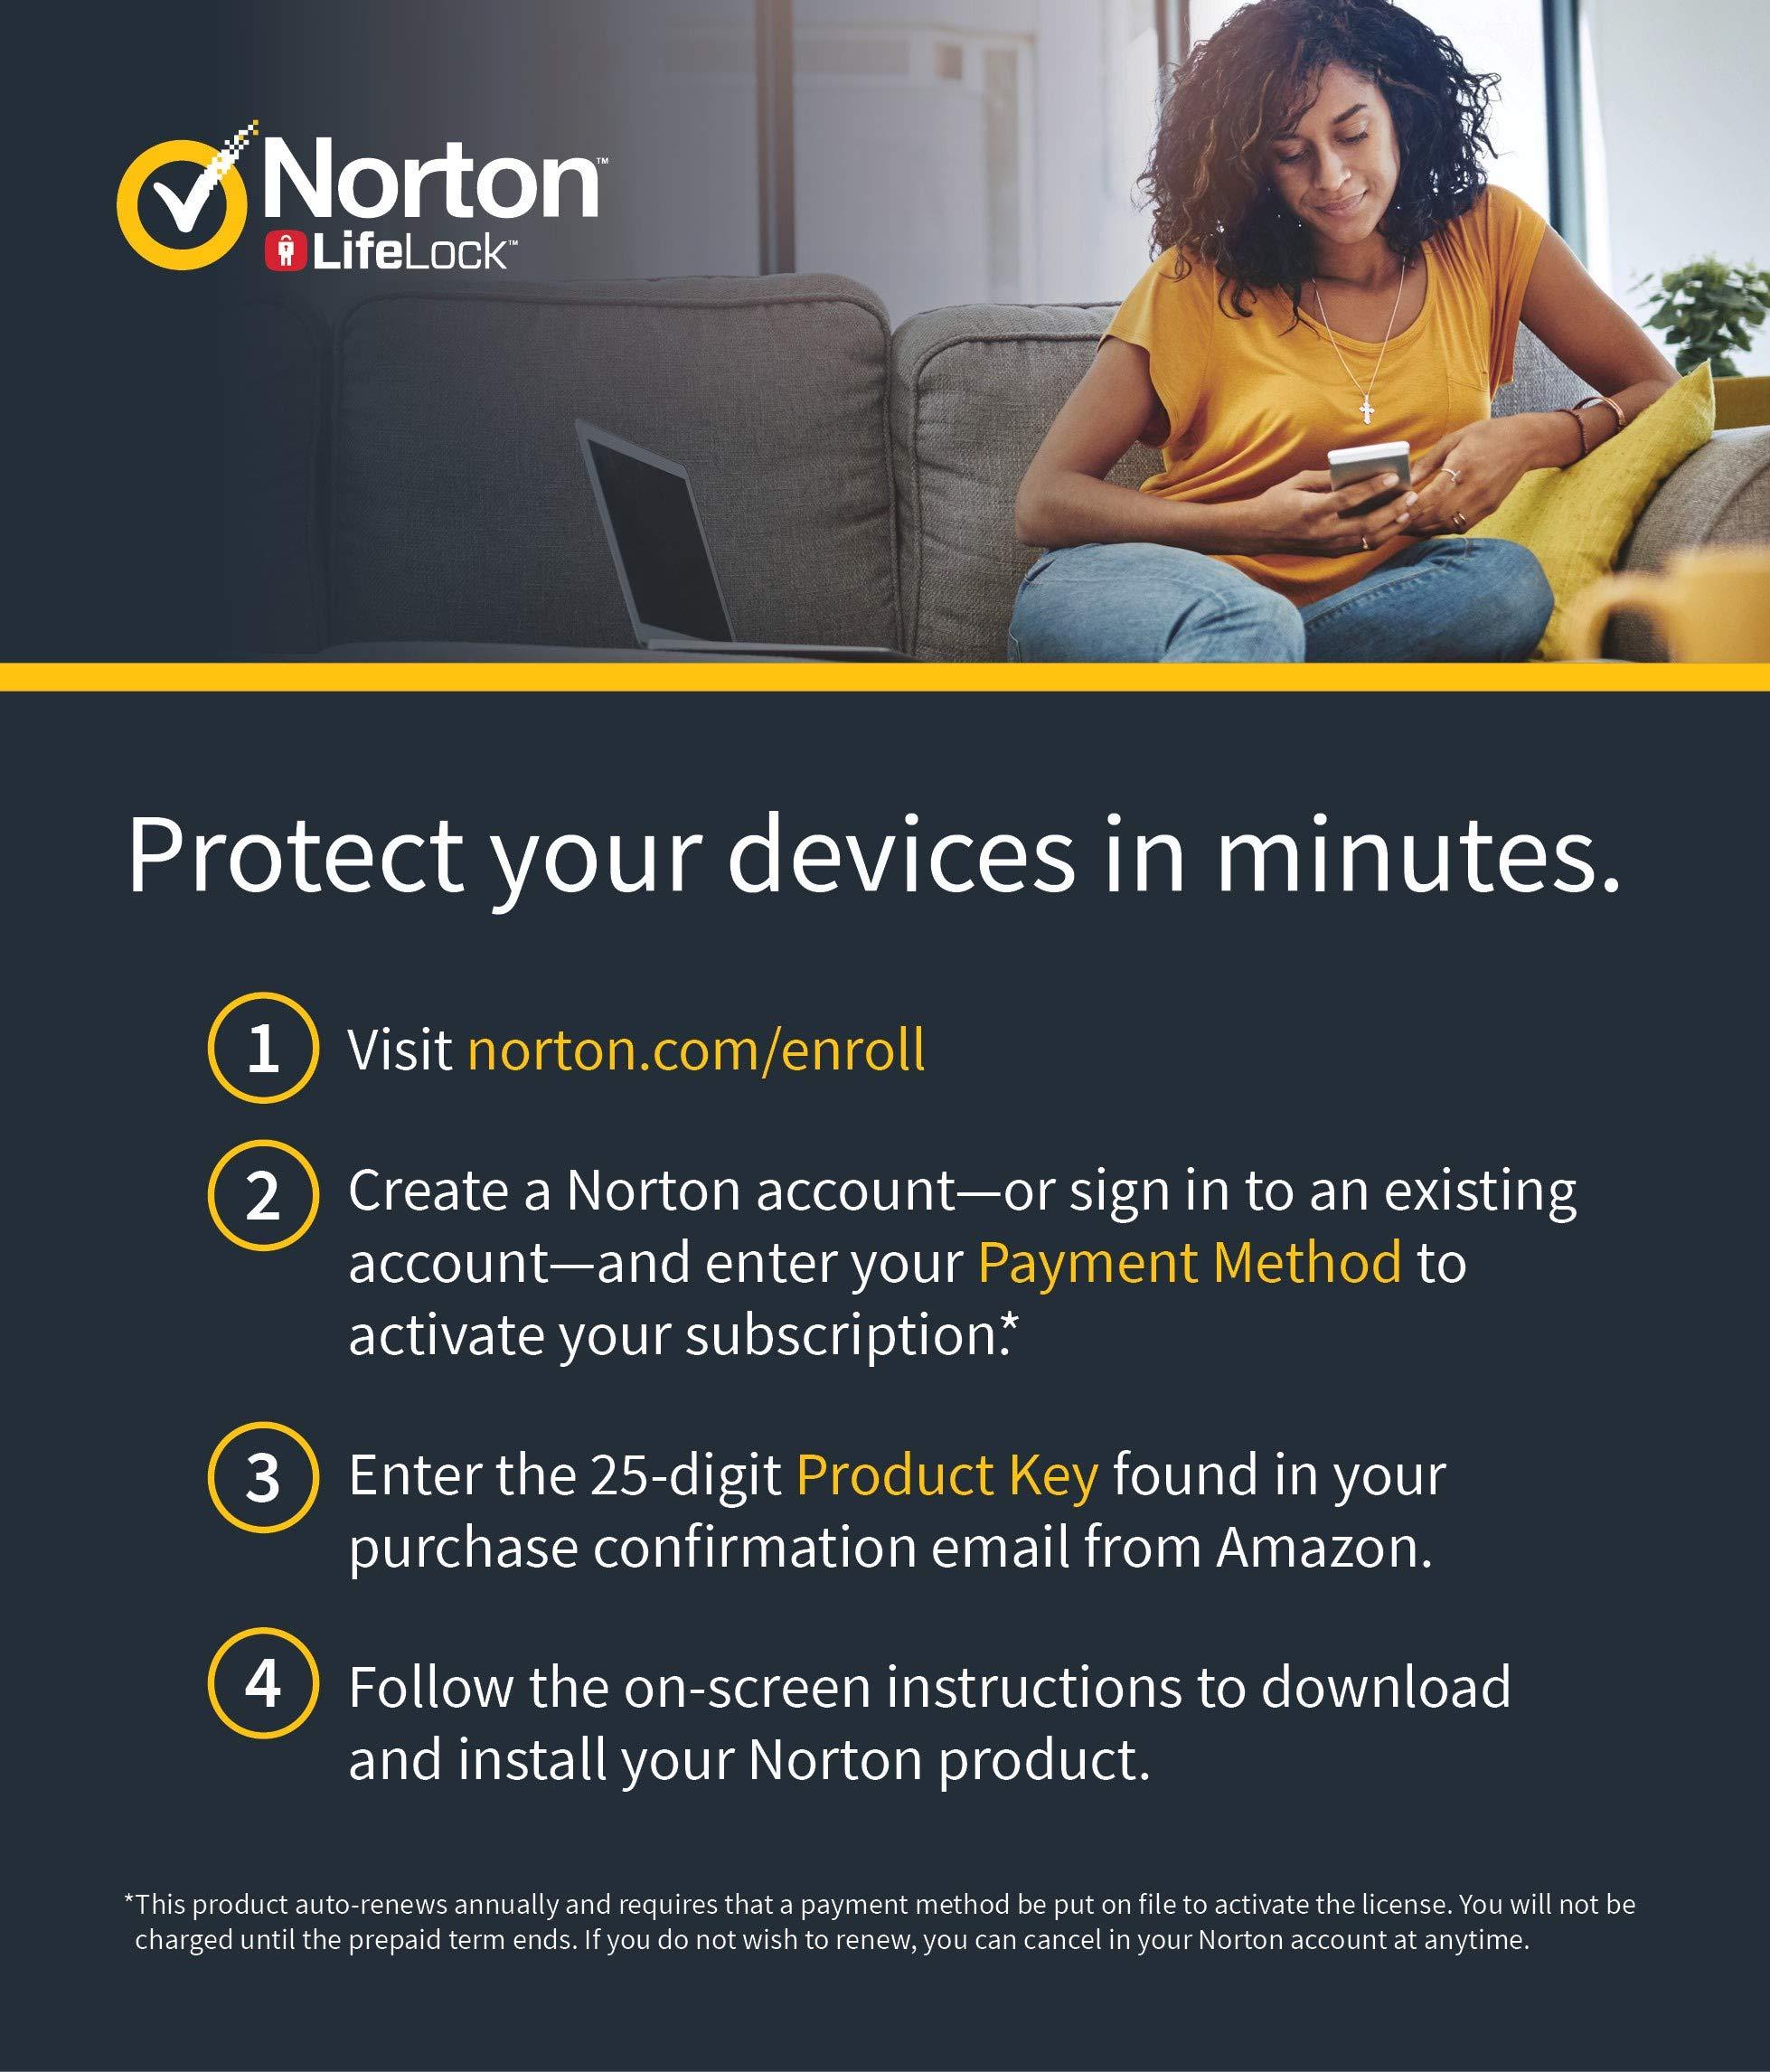 NEW Norton AntiVirus Plus – Antivirus software for 1 PC or